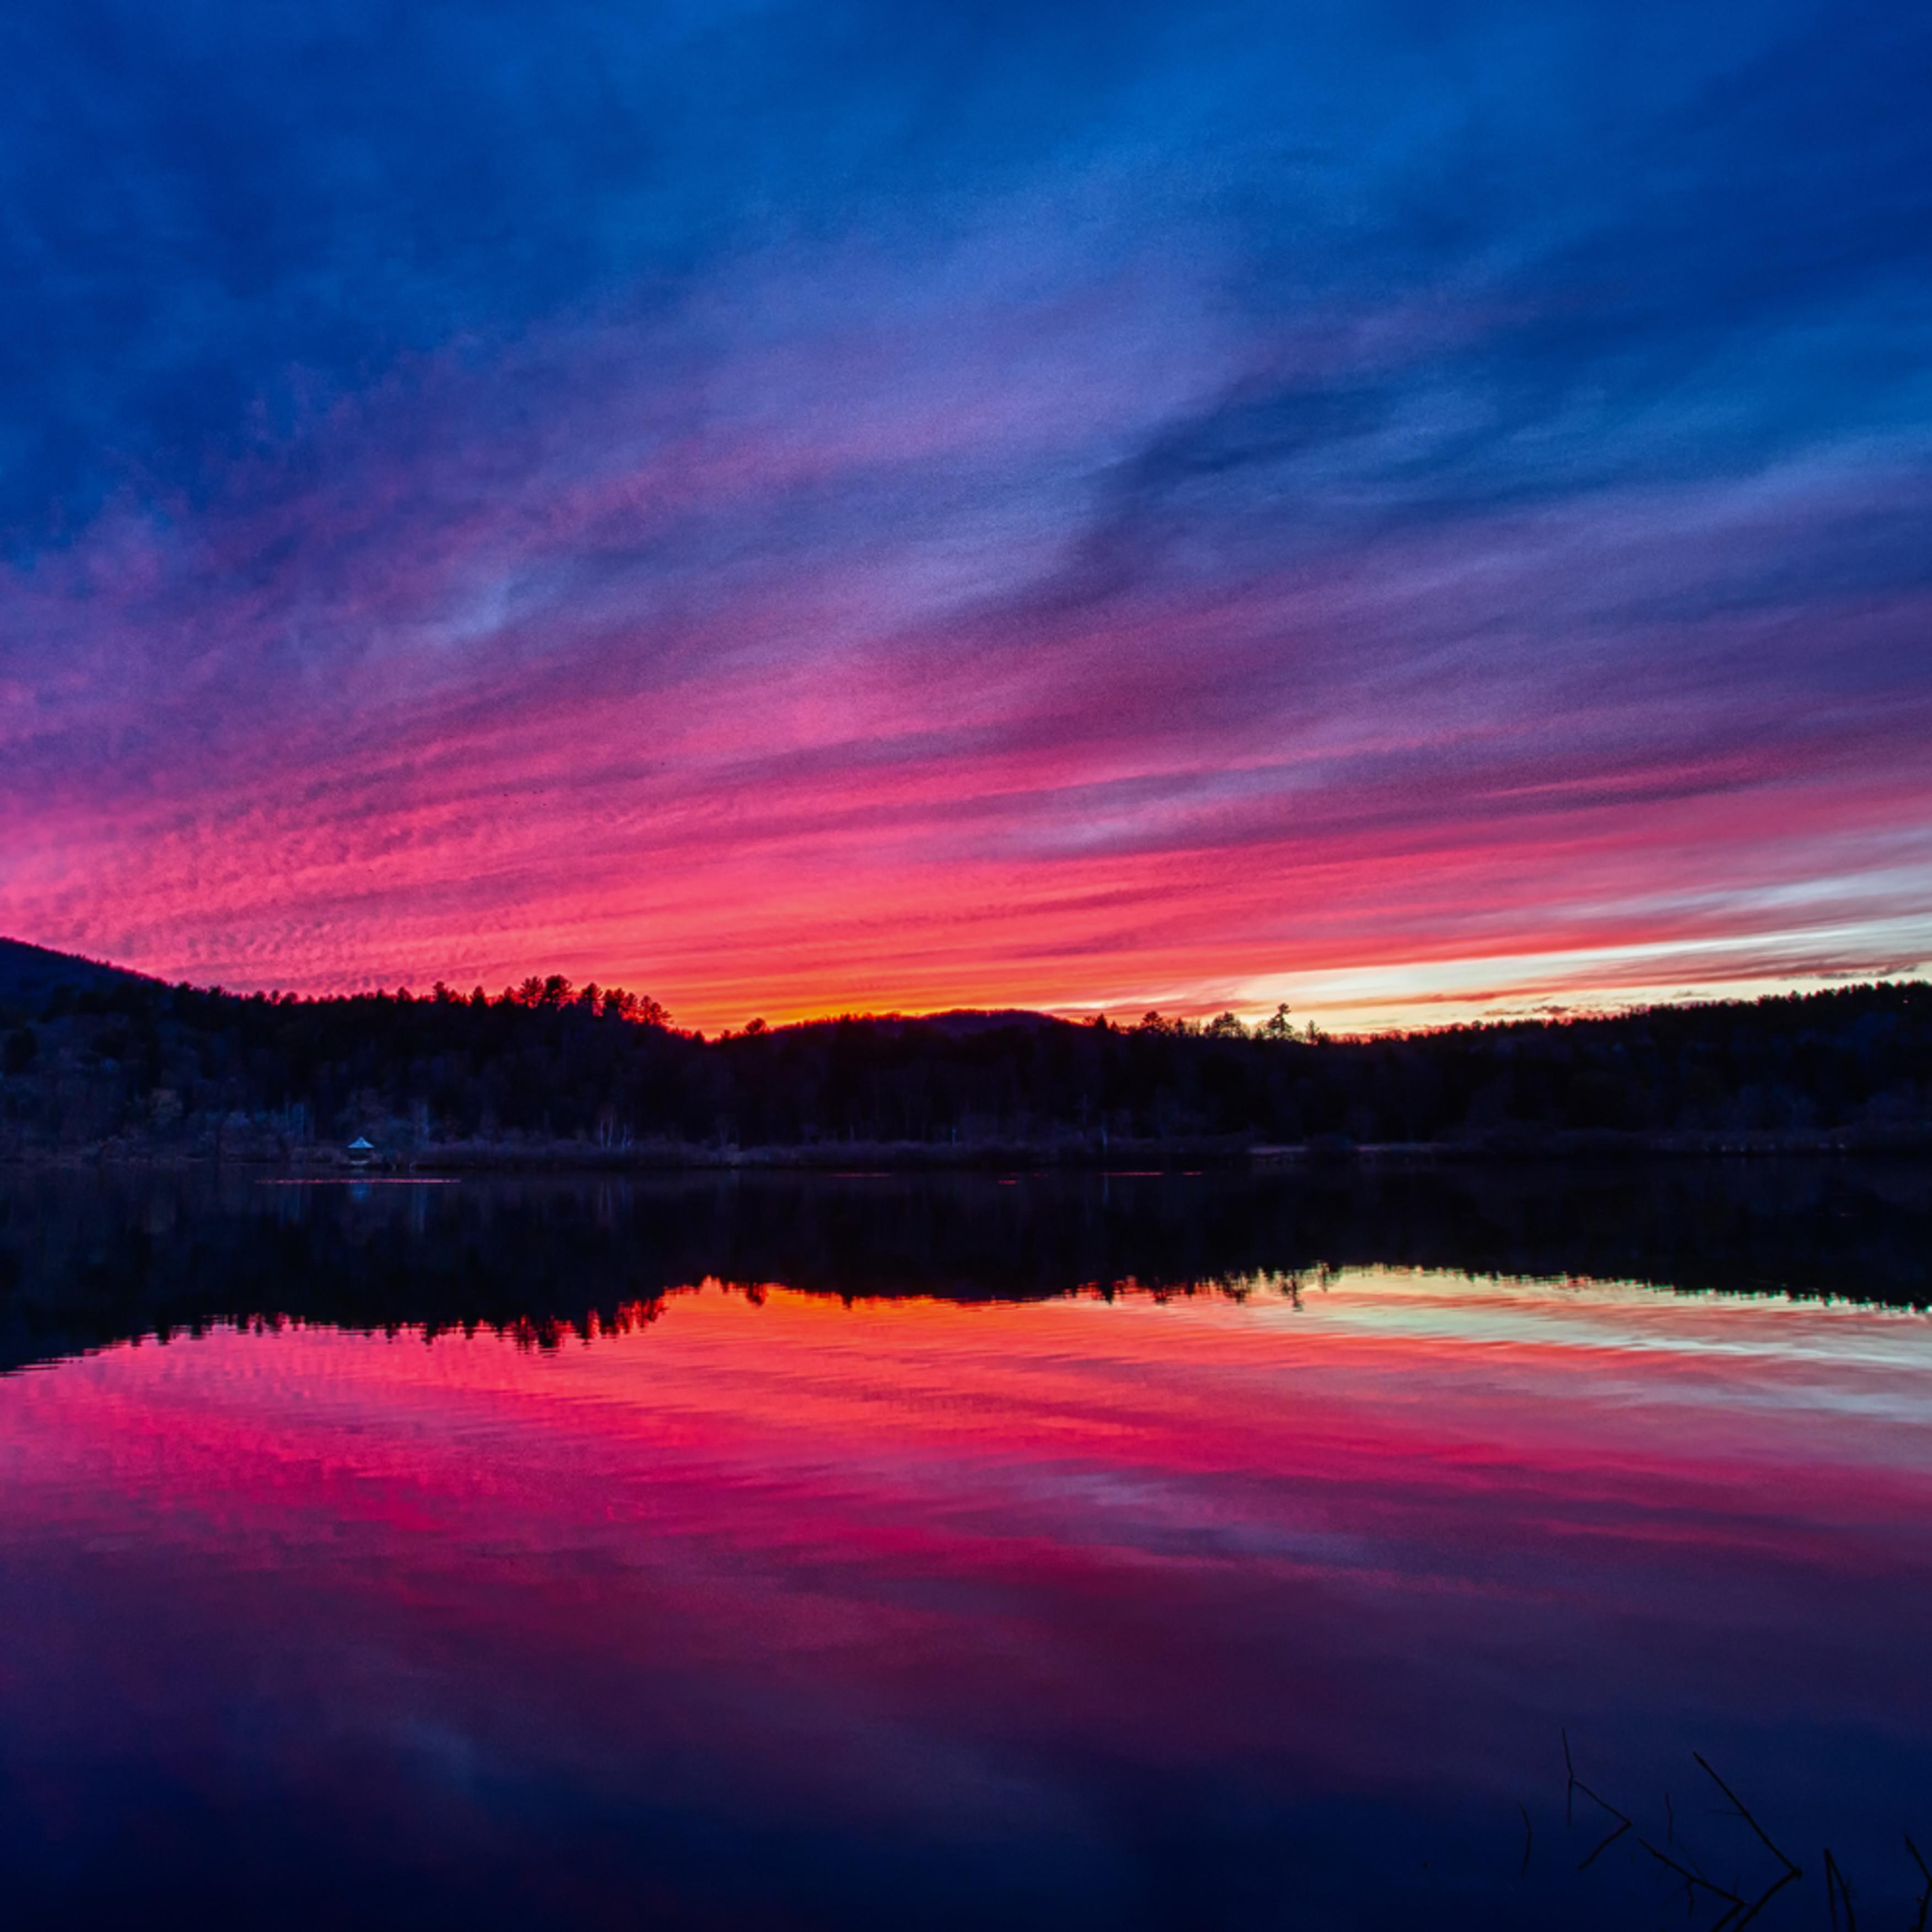 Technicolor sunsets uj86zq